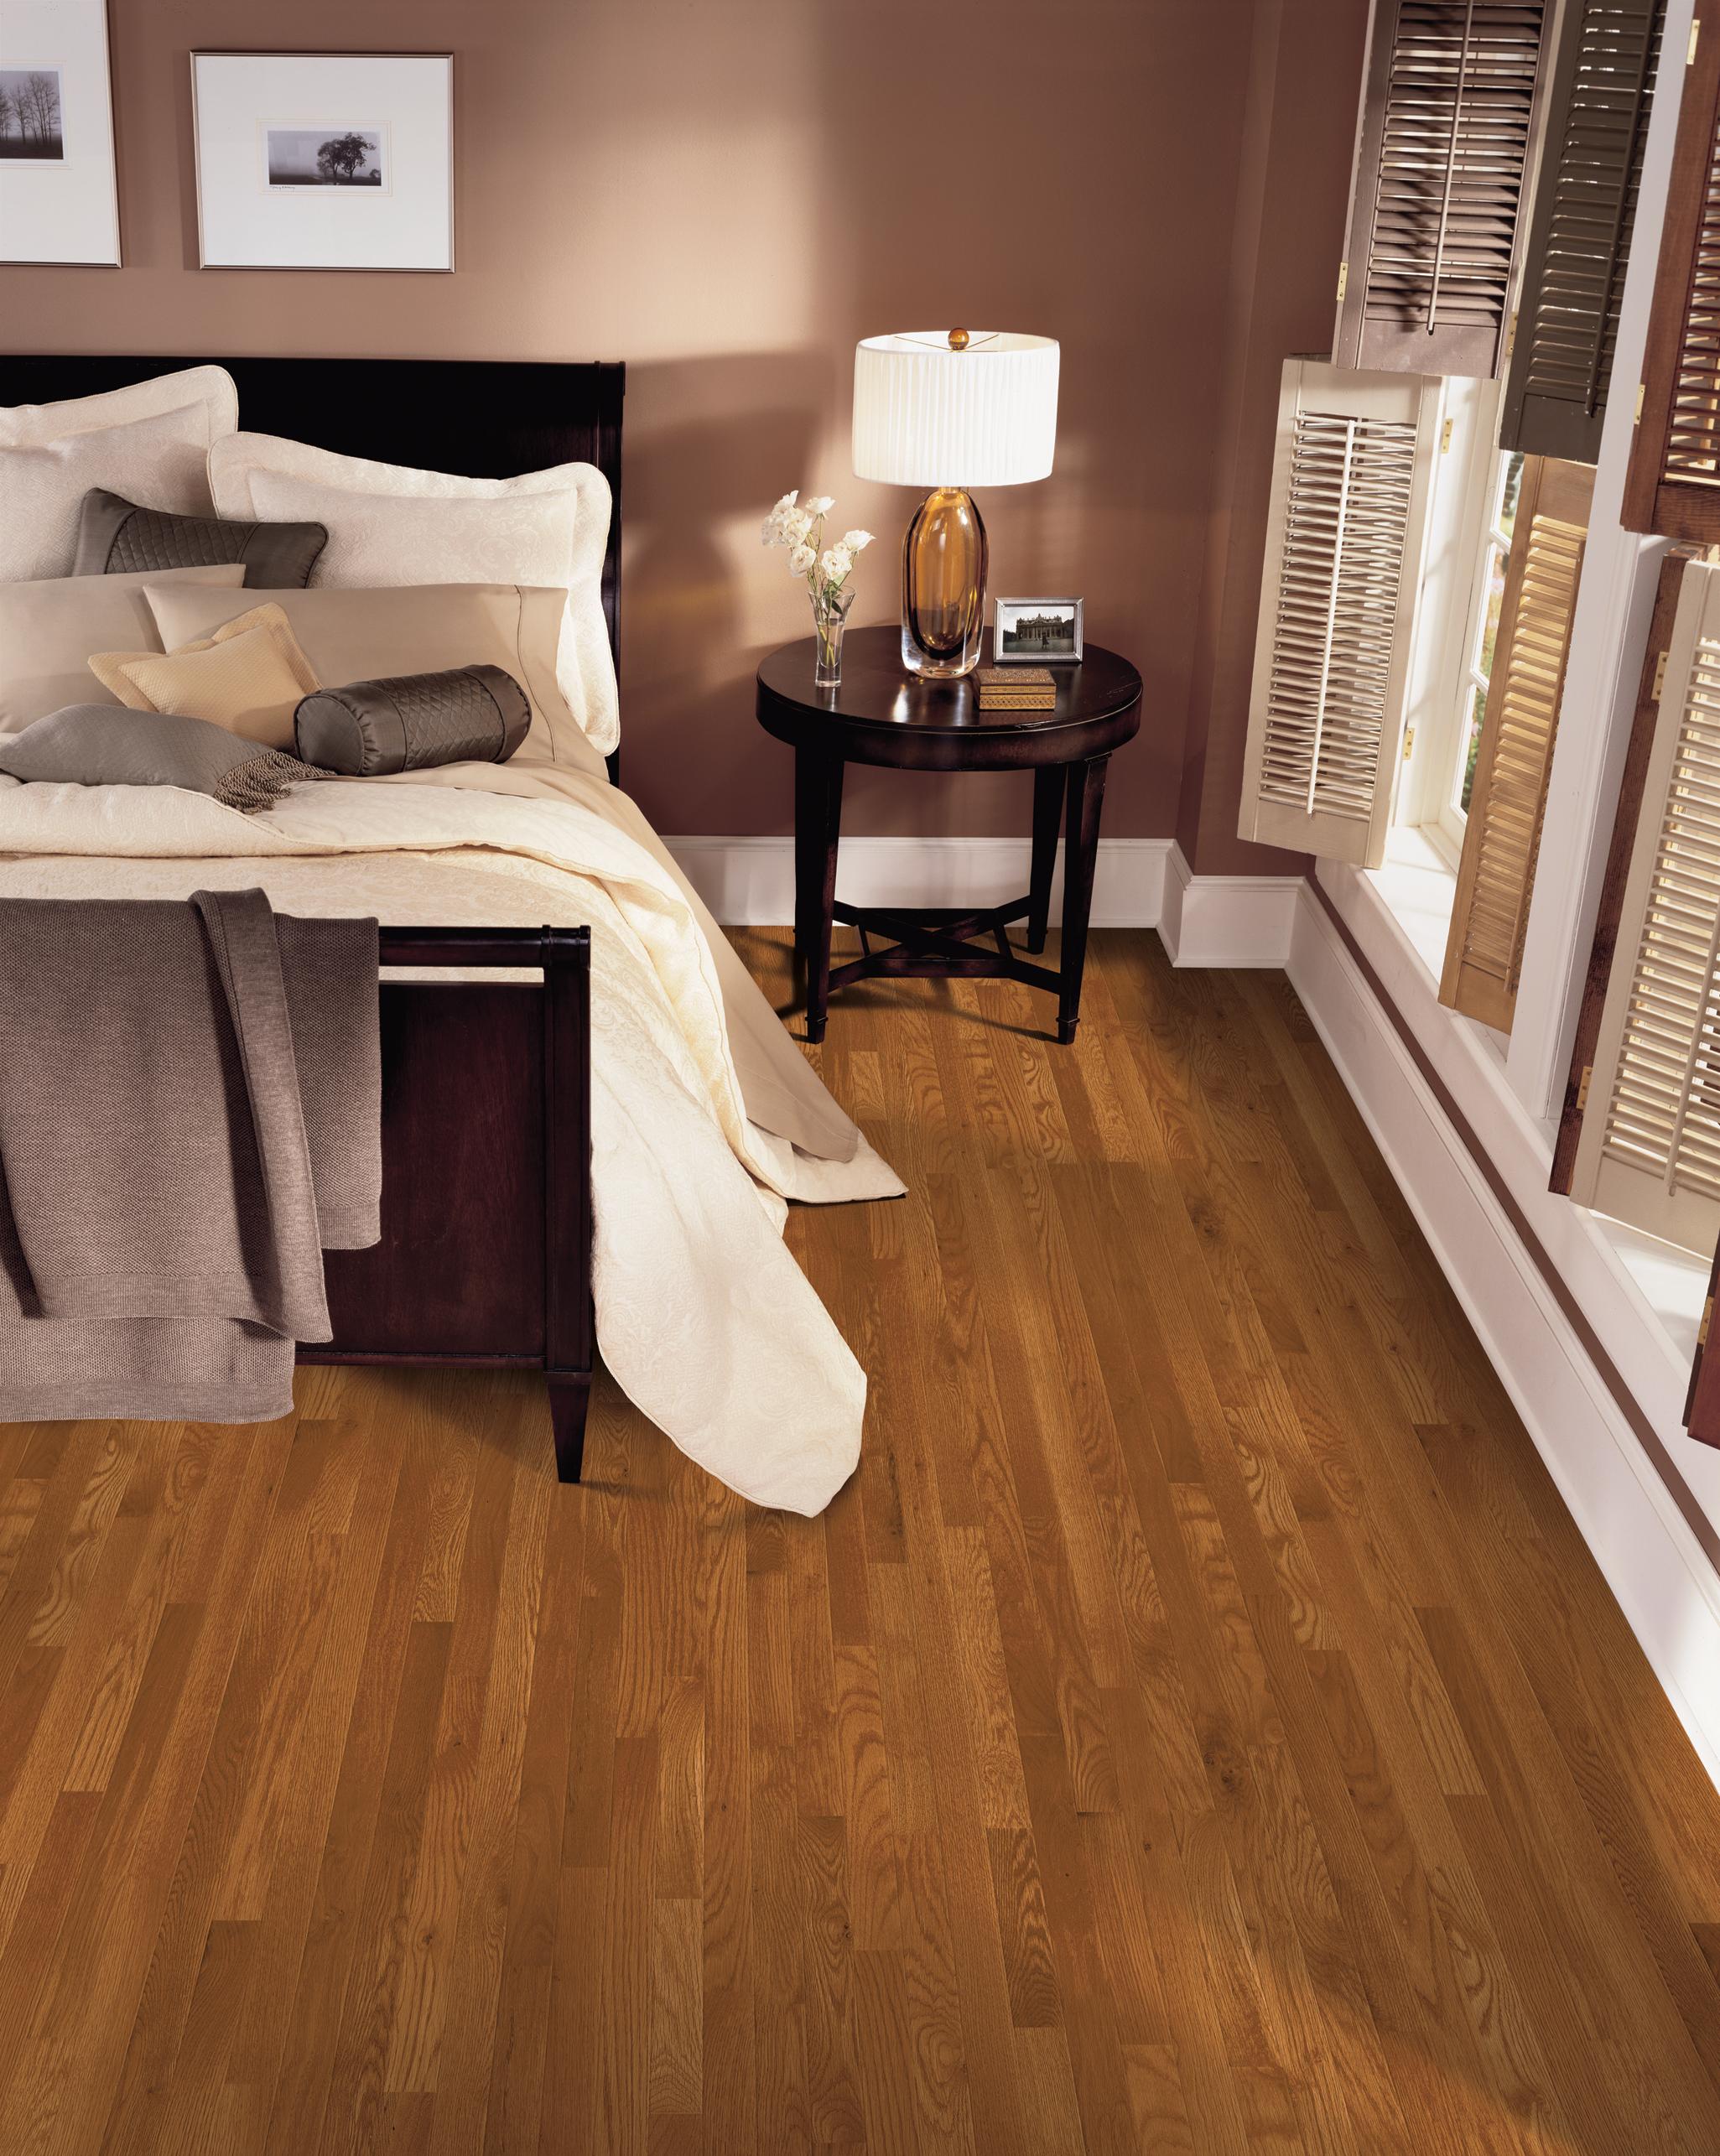 3//4 In Bruce Natural Laurel Strip Oak Wood Flooring x 2-1//4 In.